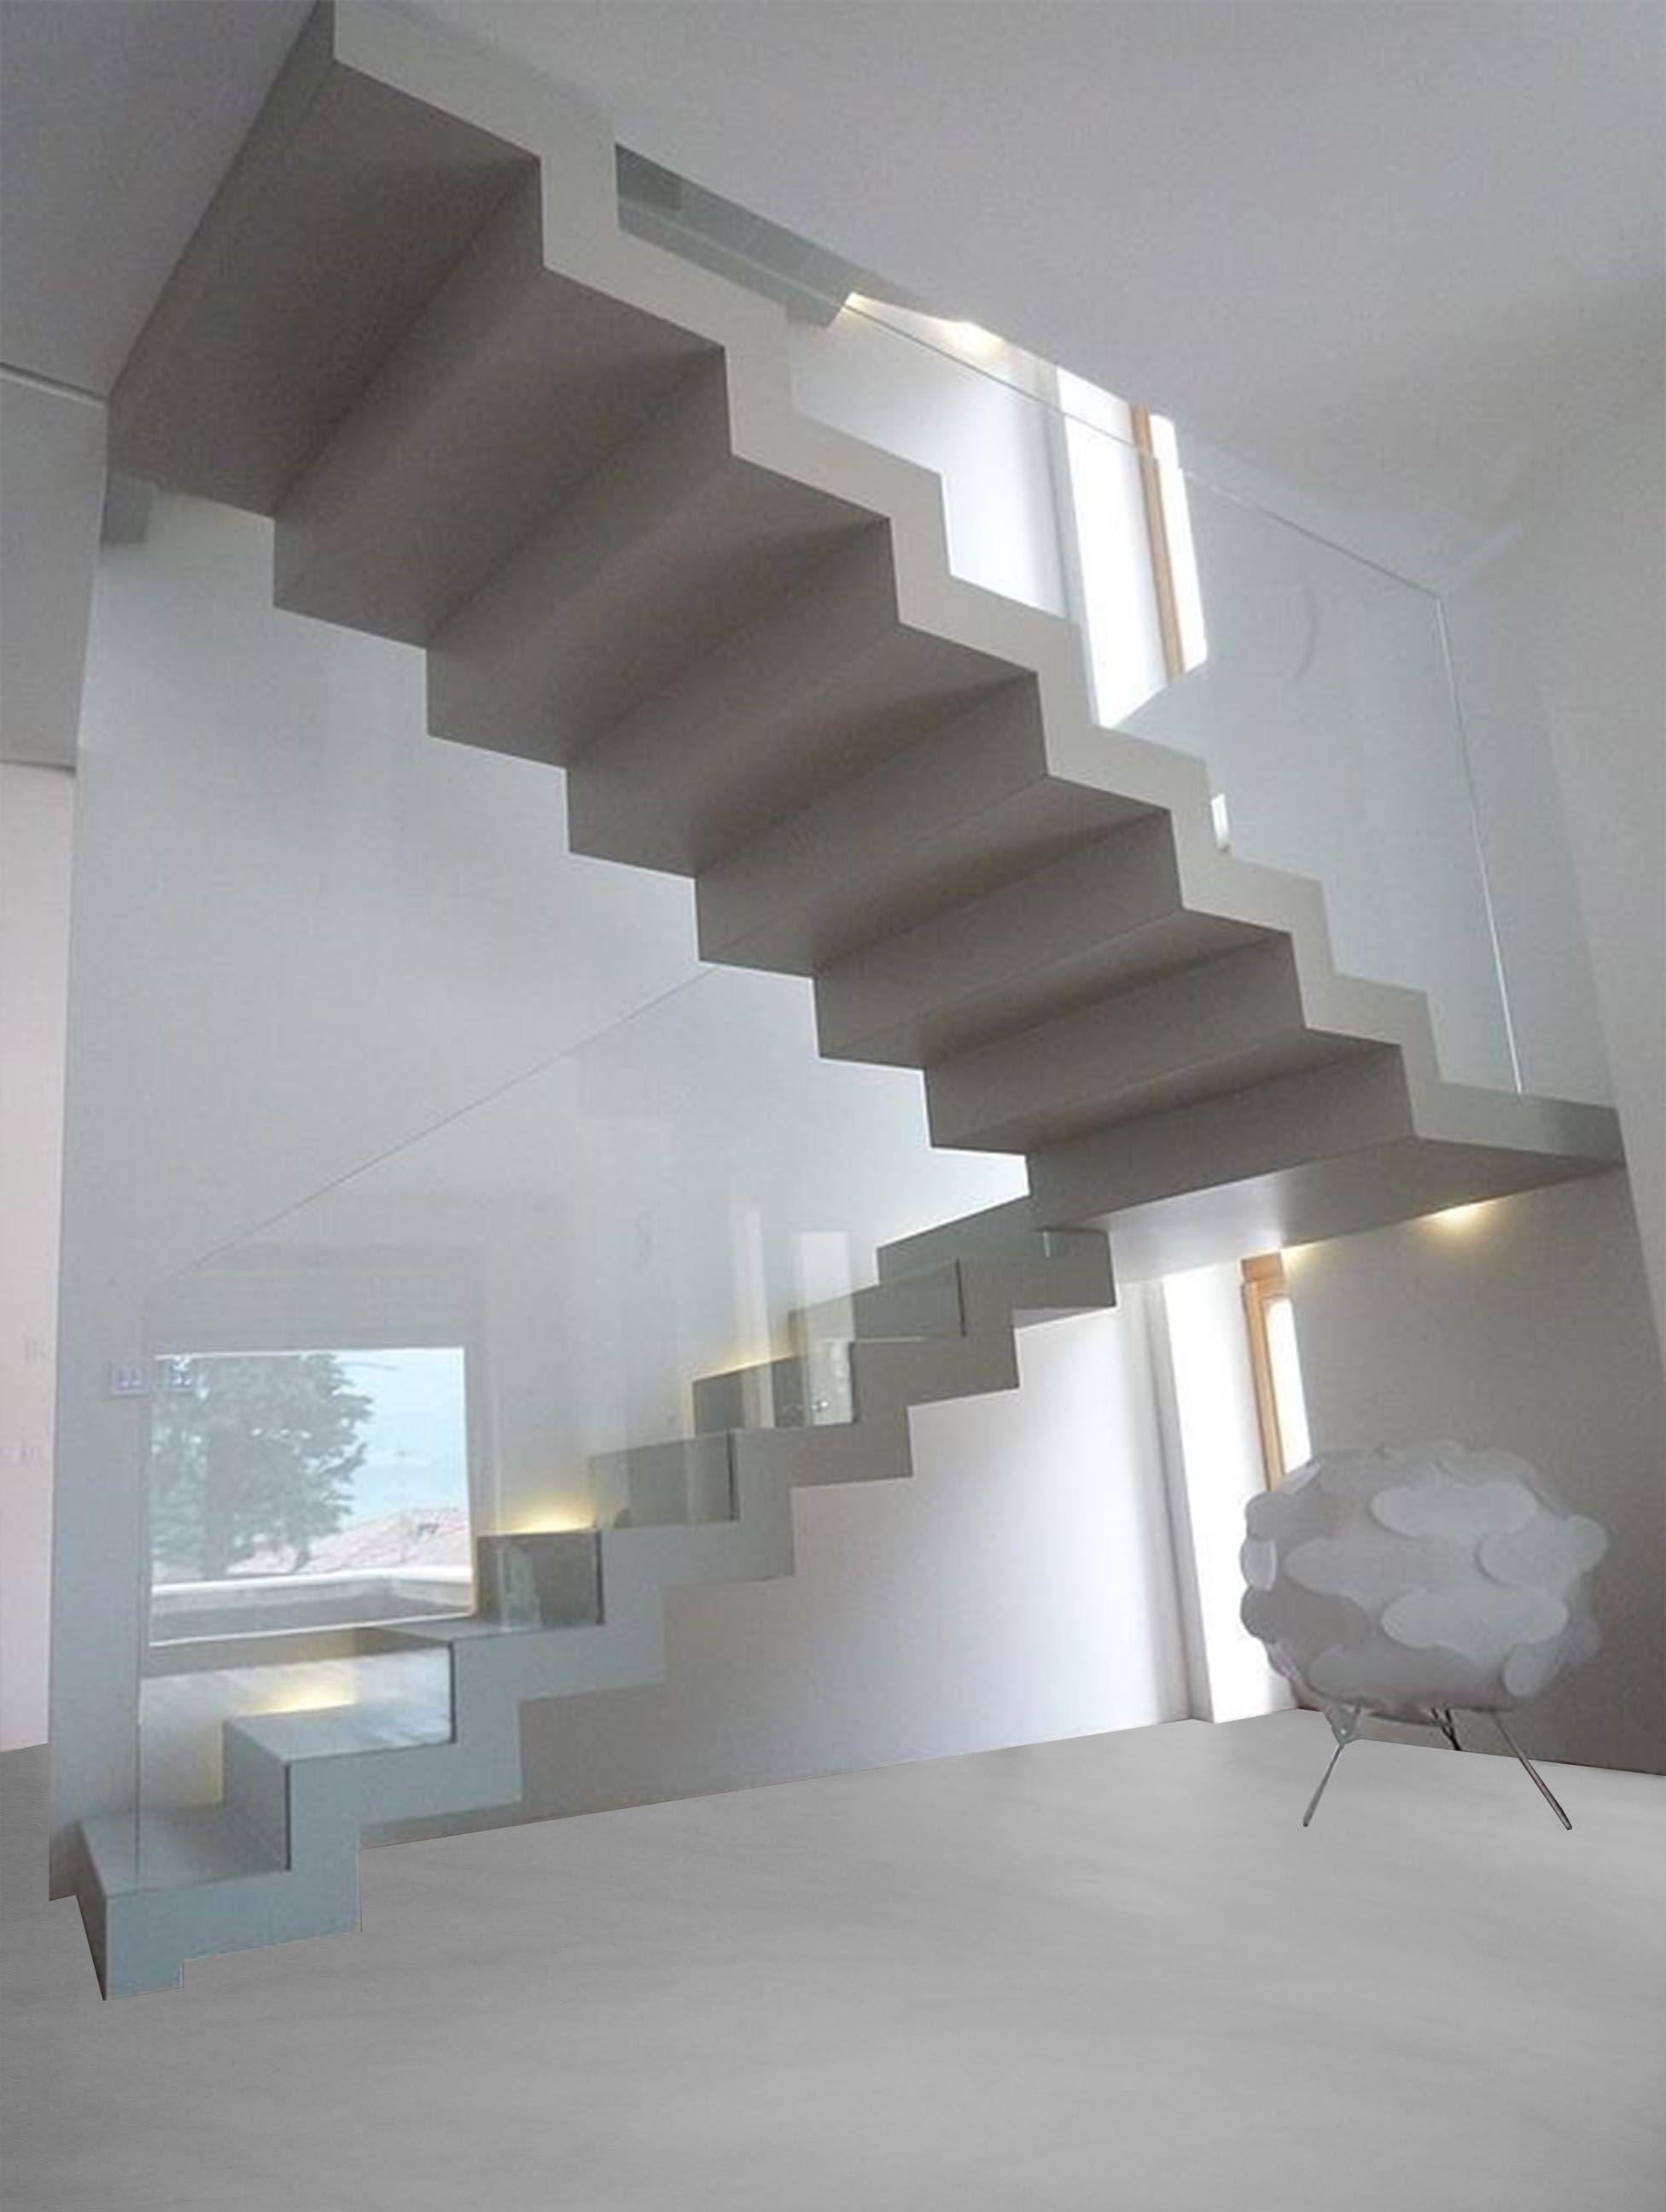 Pin By Bekkah Petree On Modern Home Design Home Stairs Design Stairs Design House Stairs